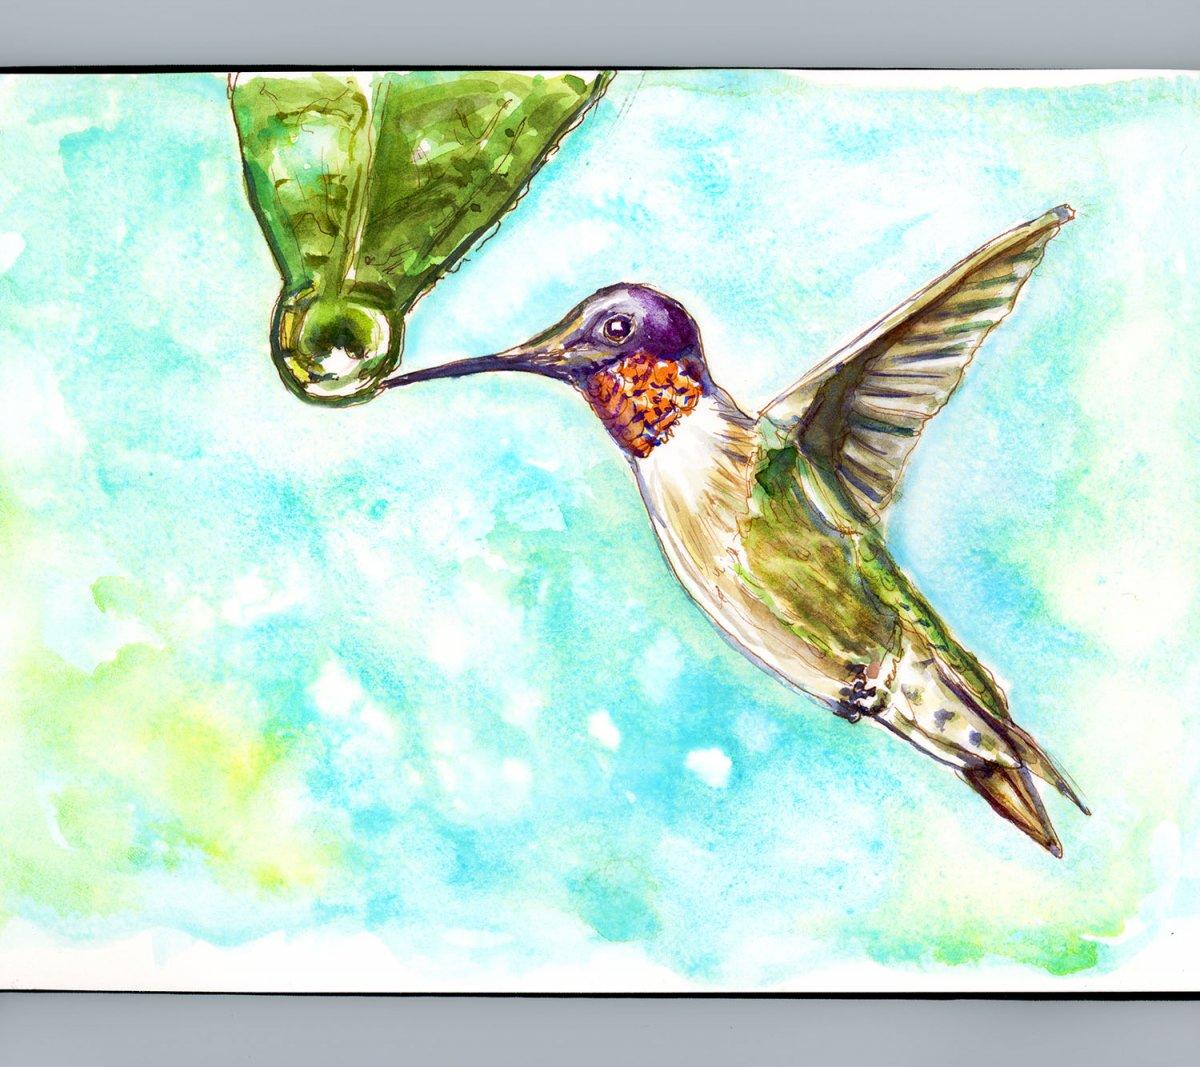 Day 19 - World Watercolor Month Rainy Days Hummingbird - Doodlewash